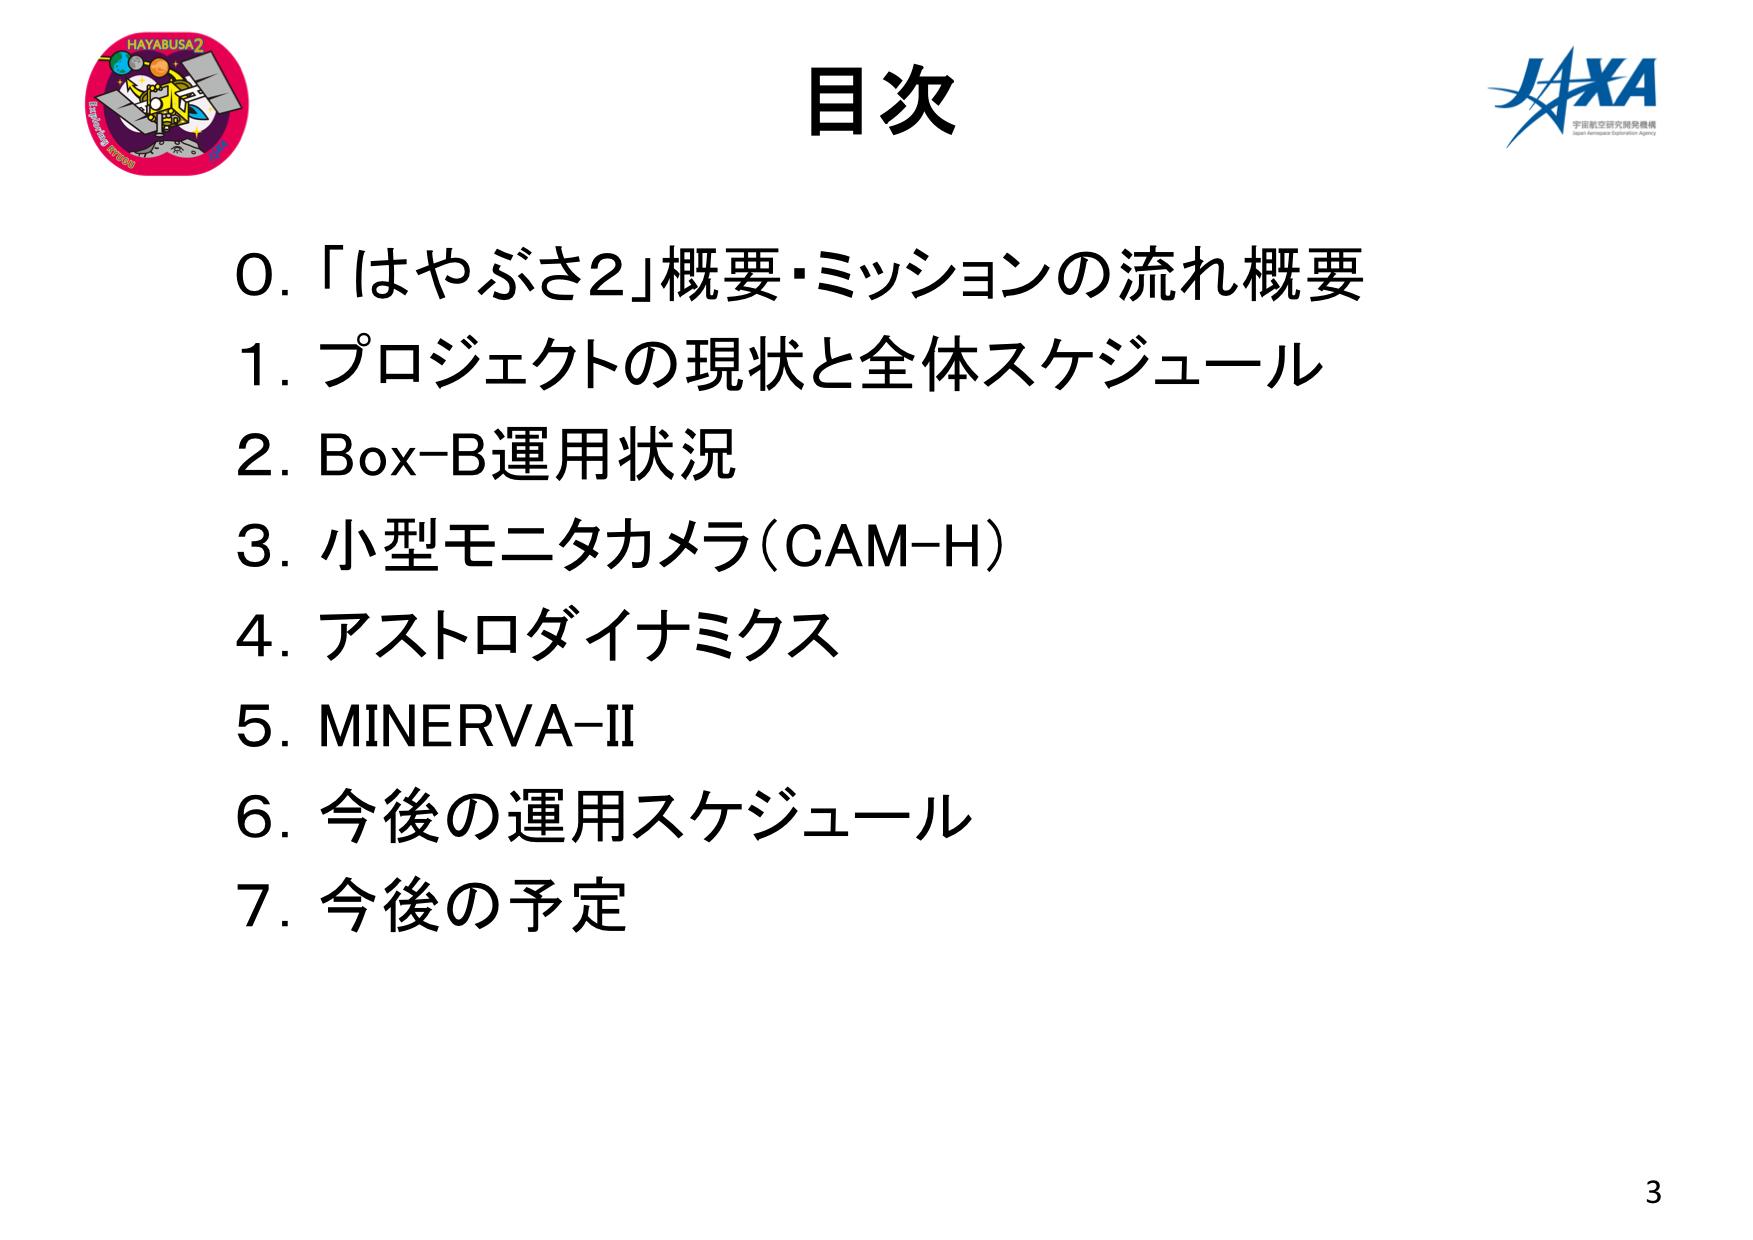 f:id:Imamura:20180905231935p:plain